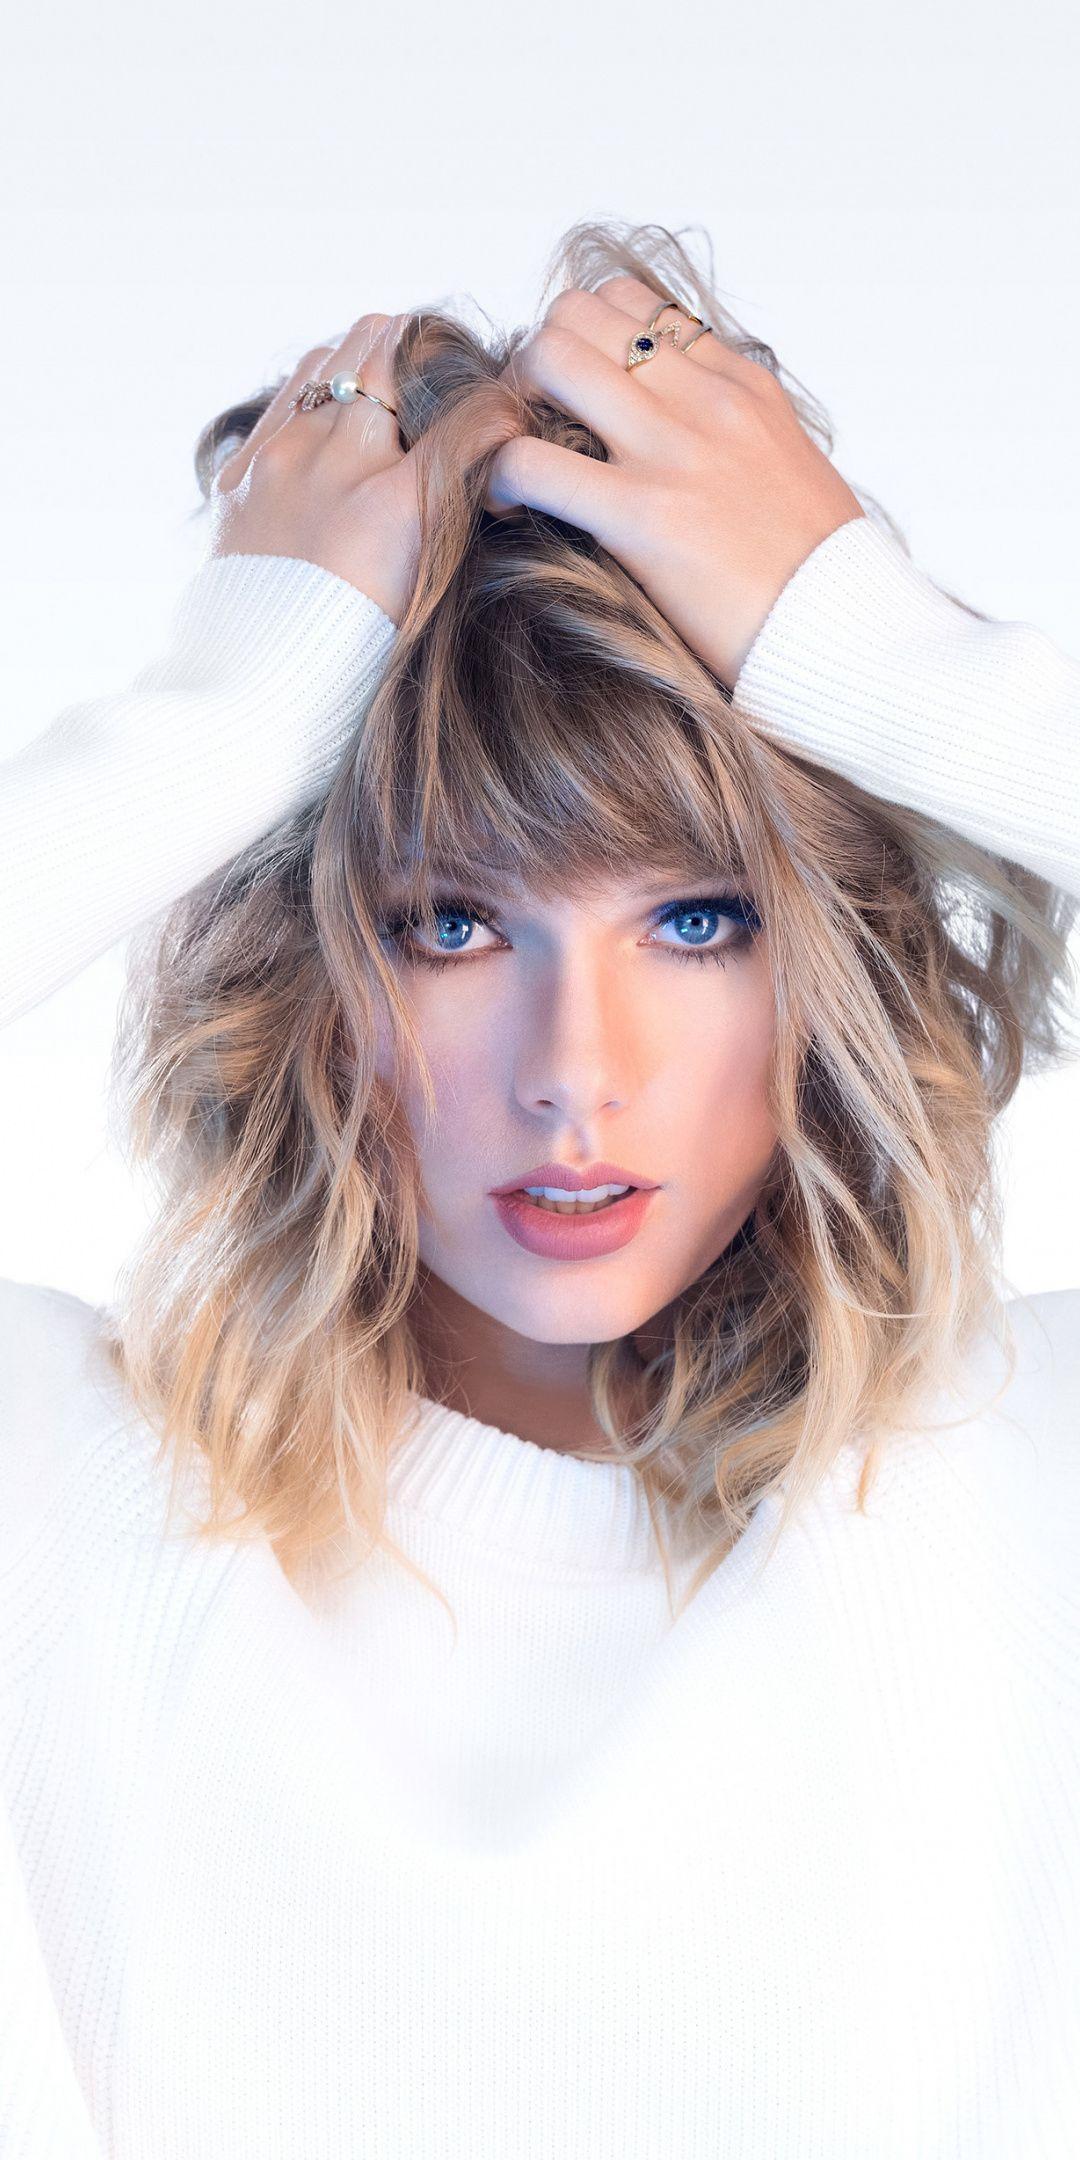 1080x2160 Taylor Swift Blue Eyes 2019 Wallpaper Taylor Swift Wallpaper Taylor Swift Photoshoot Taylor Swift Videos